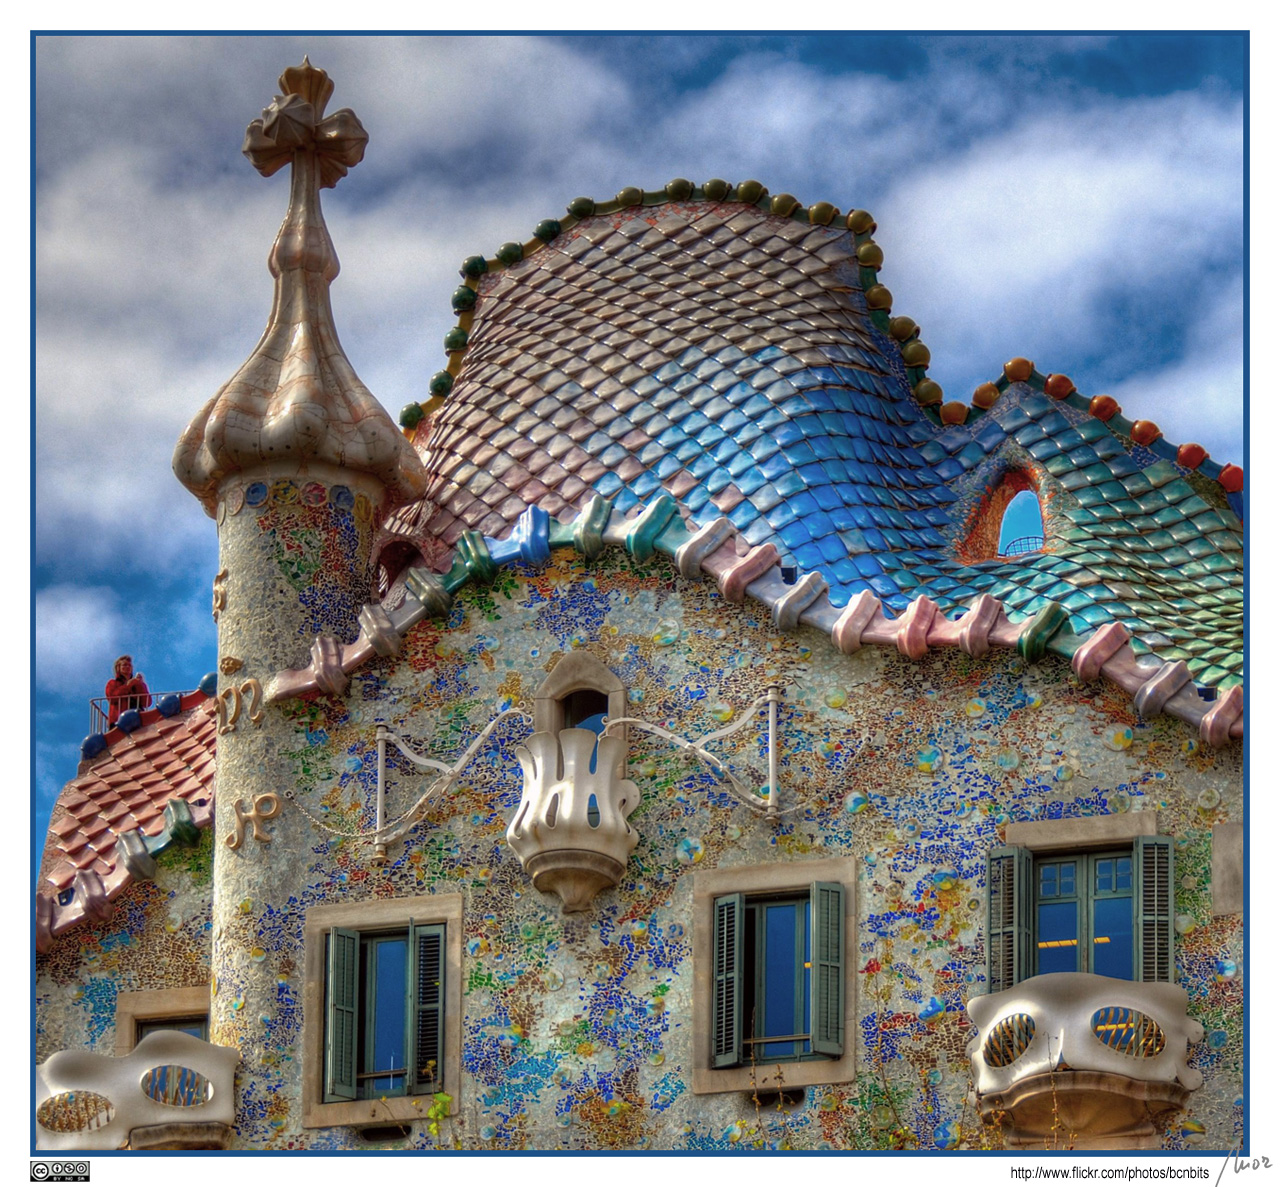 Antoni Gaudi – Responding to Nature: A 'Nut or a Genius'?